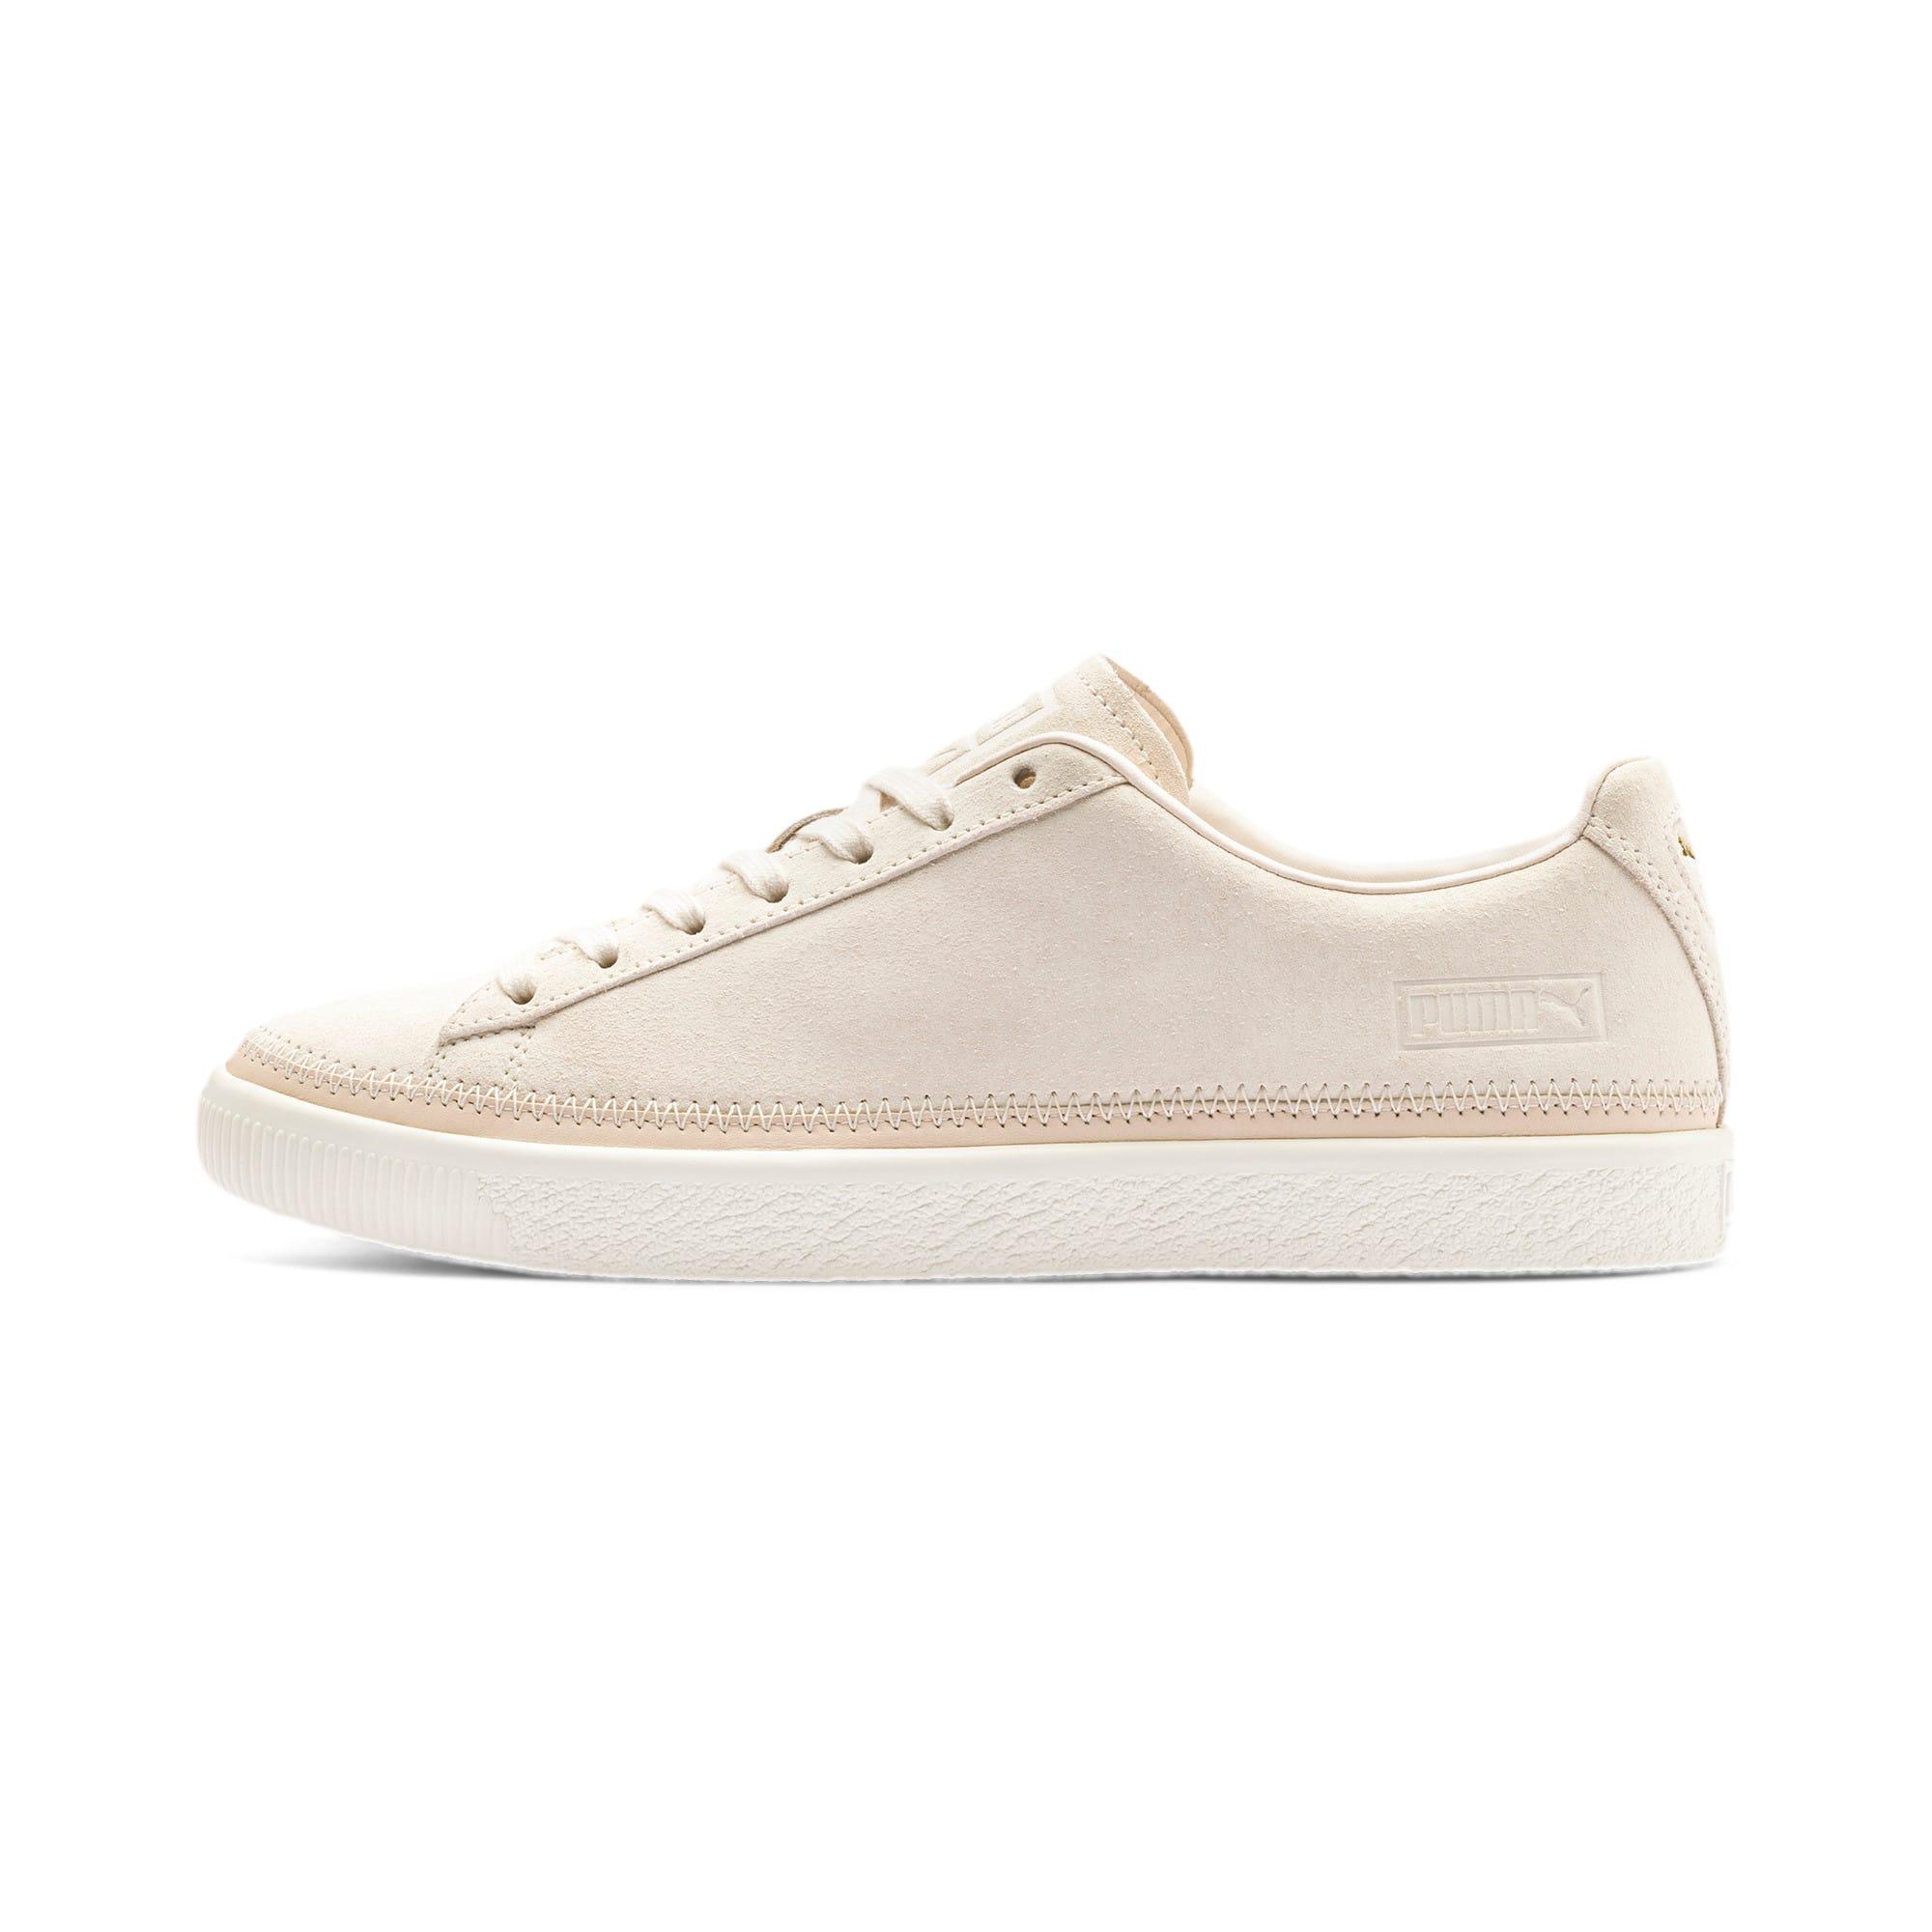 Miniatura 1 de Zapatos deportivos Suede Trim PRM, White Smoke-Whisper White, mediano